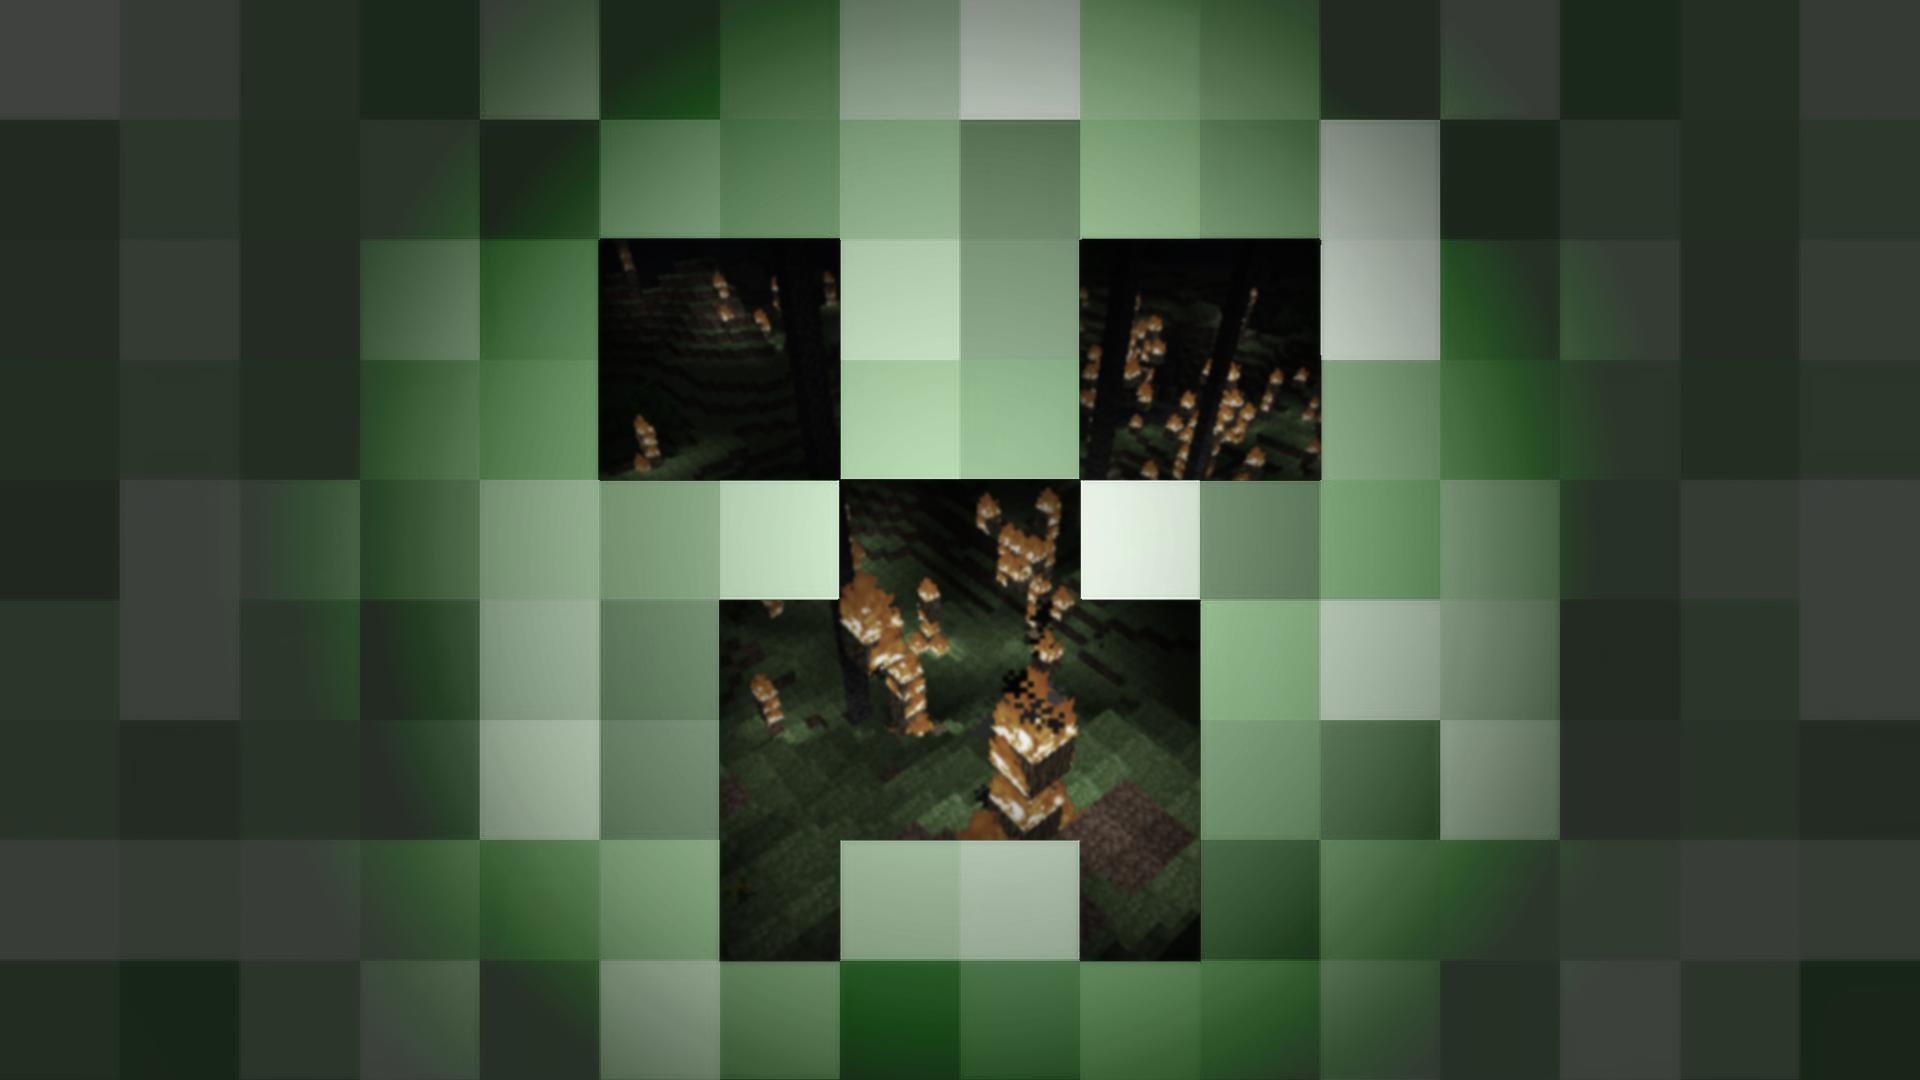 Minecraft Cool Creeper